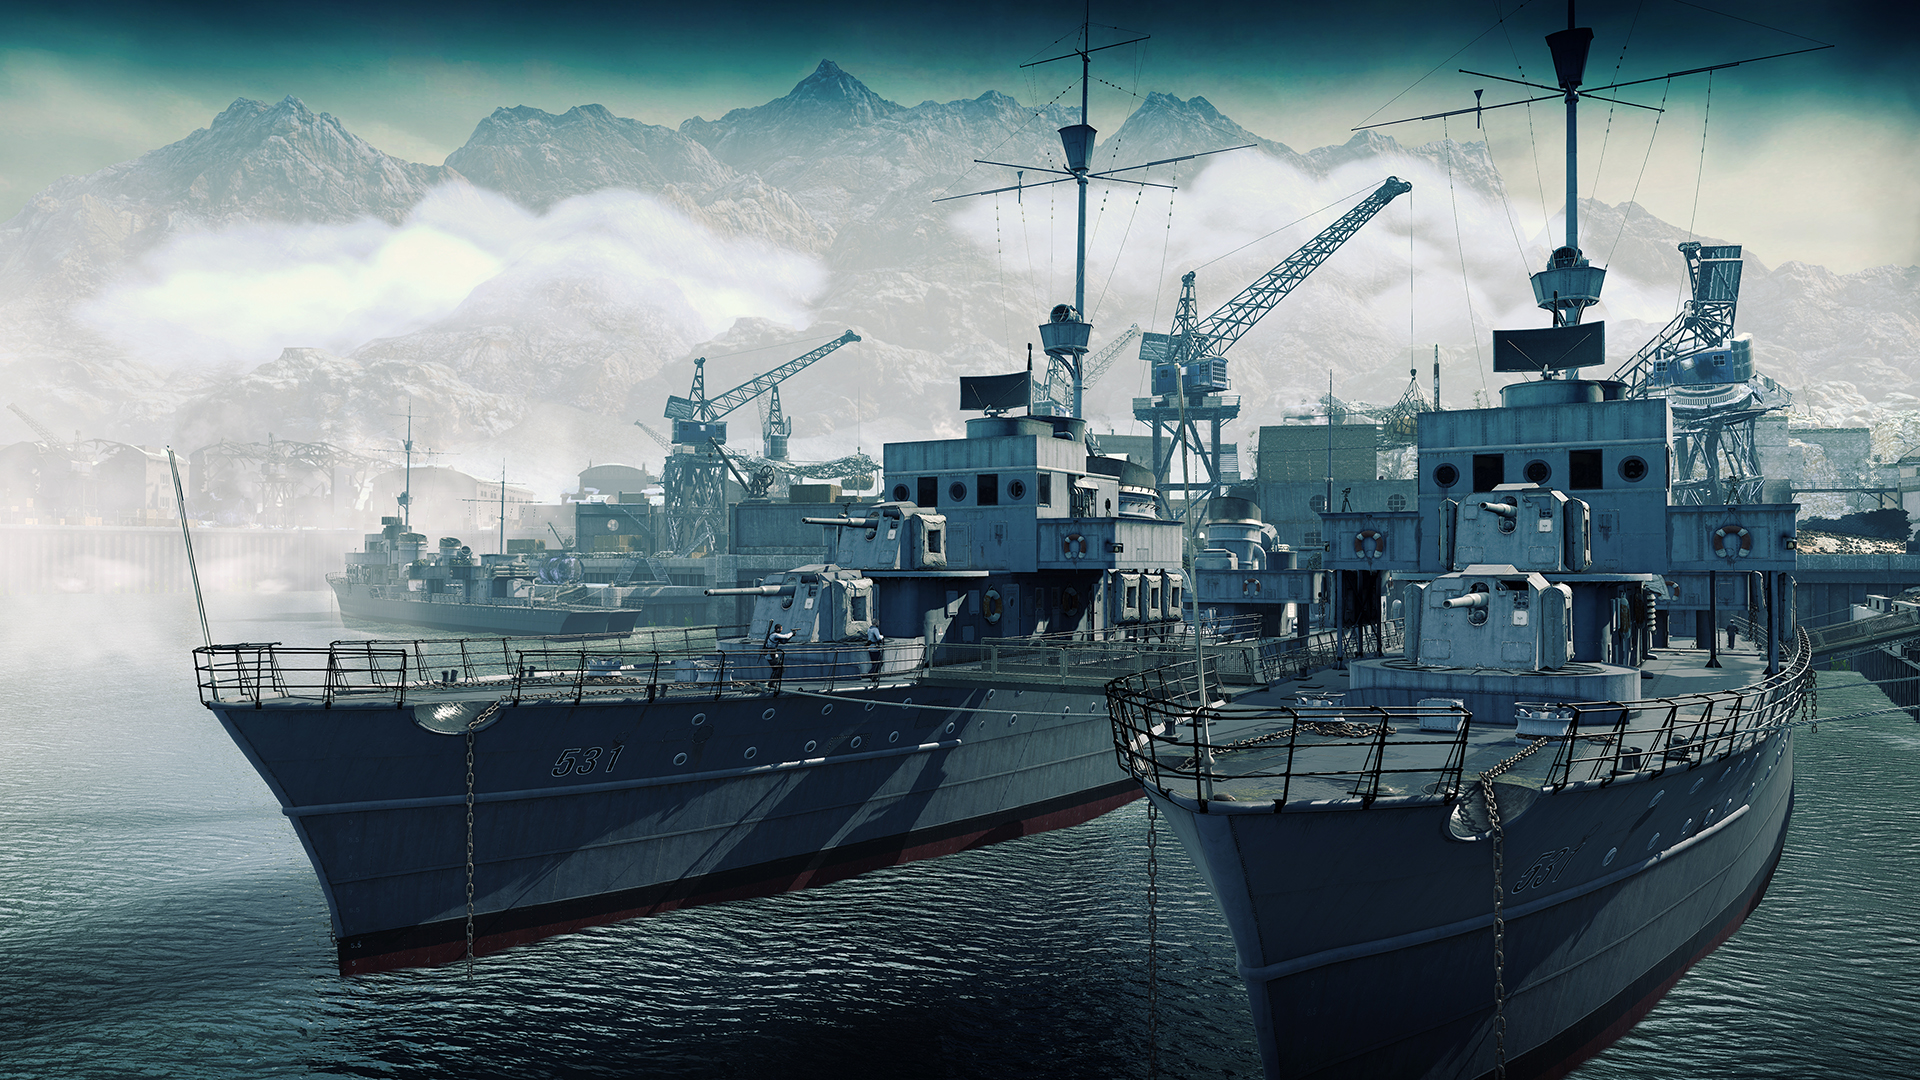 SE4_inception_02_ships_1k.jpg